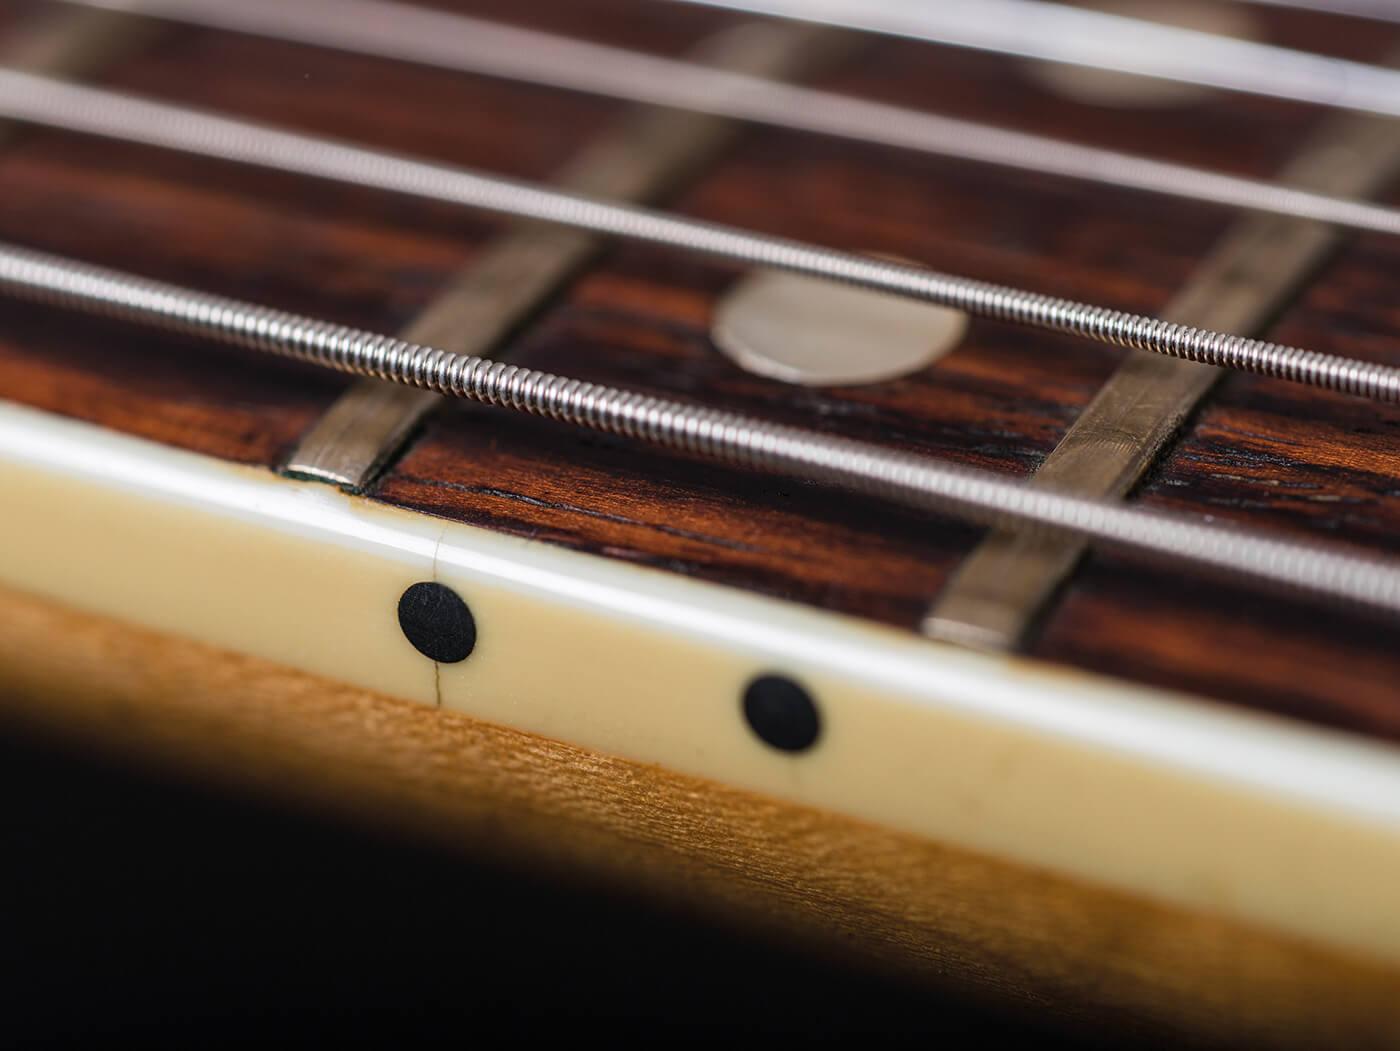 Fender 1966 Jazzmaster Ocean Turquoise fretwire